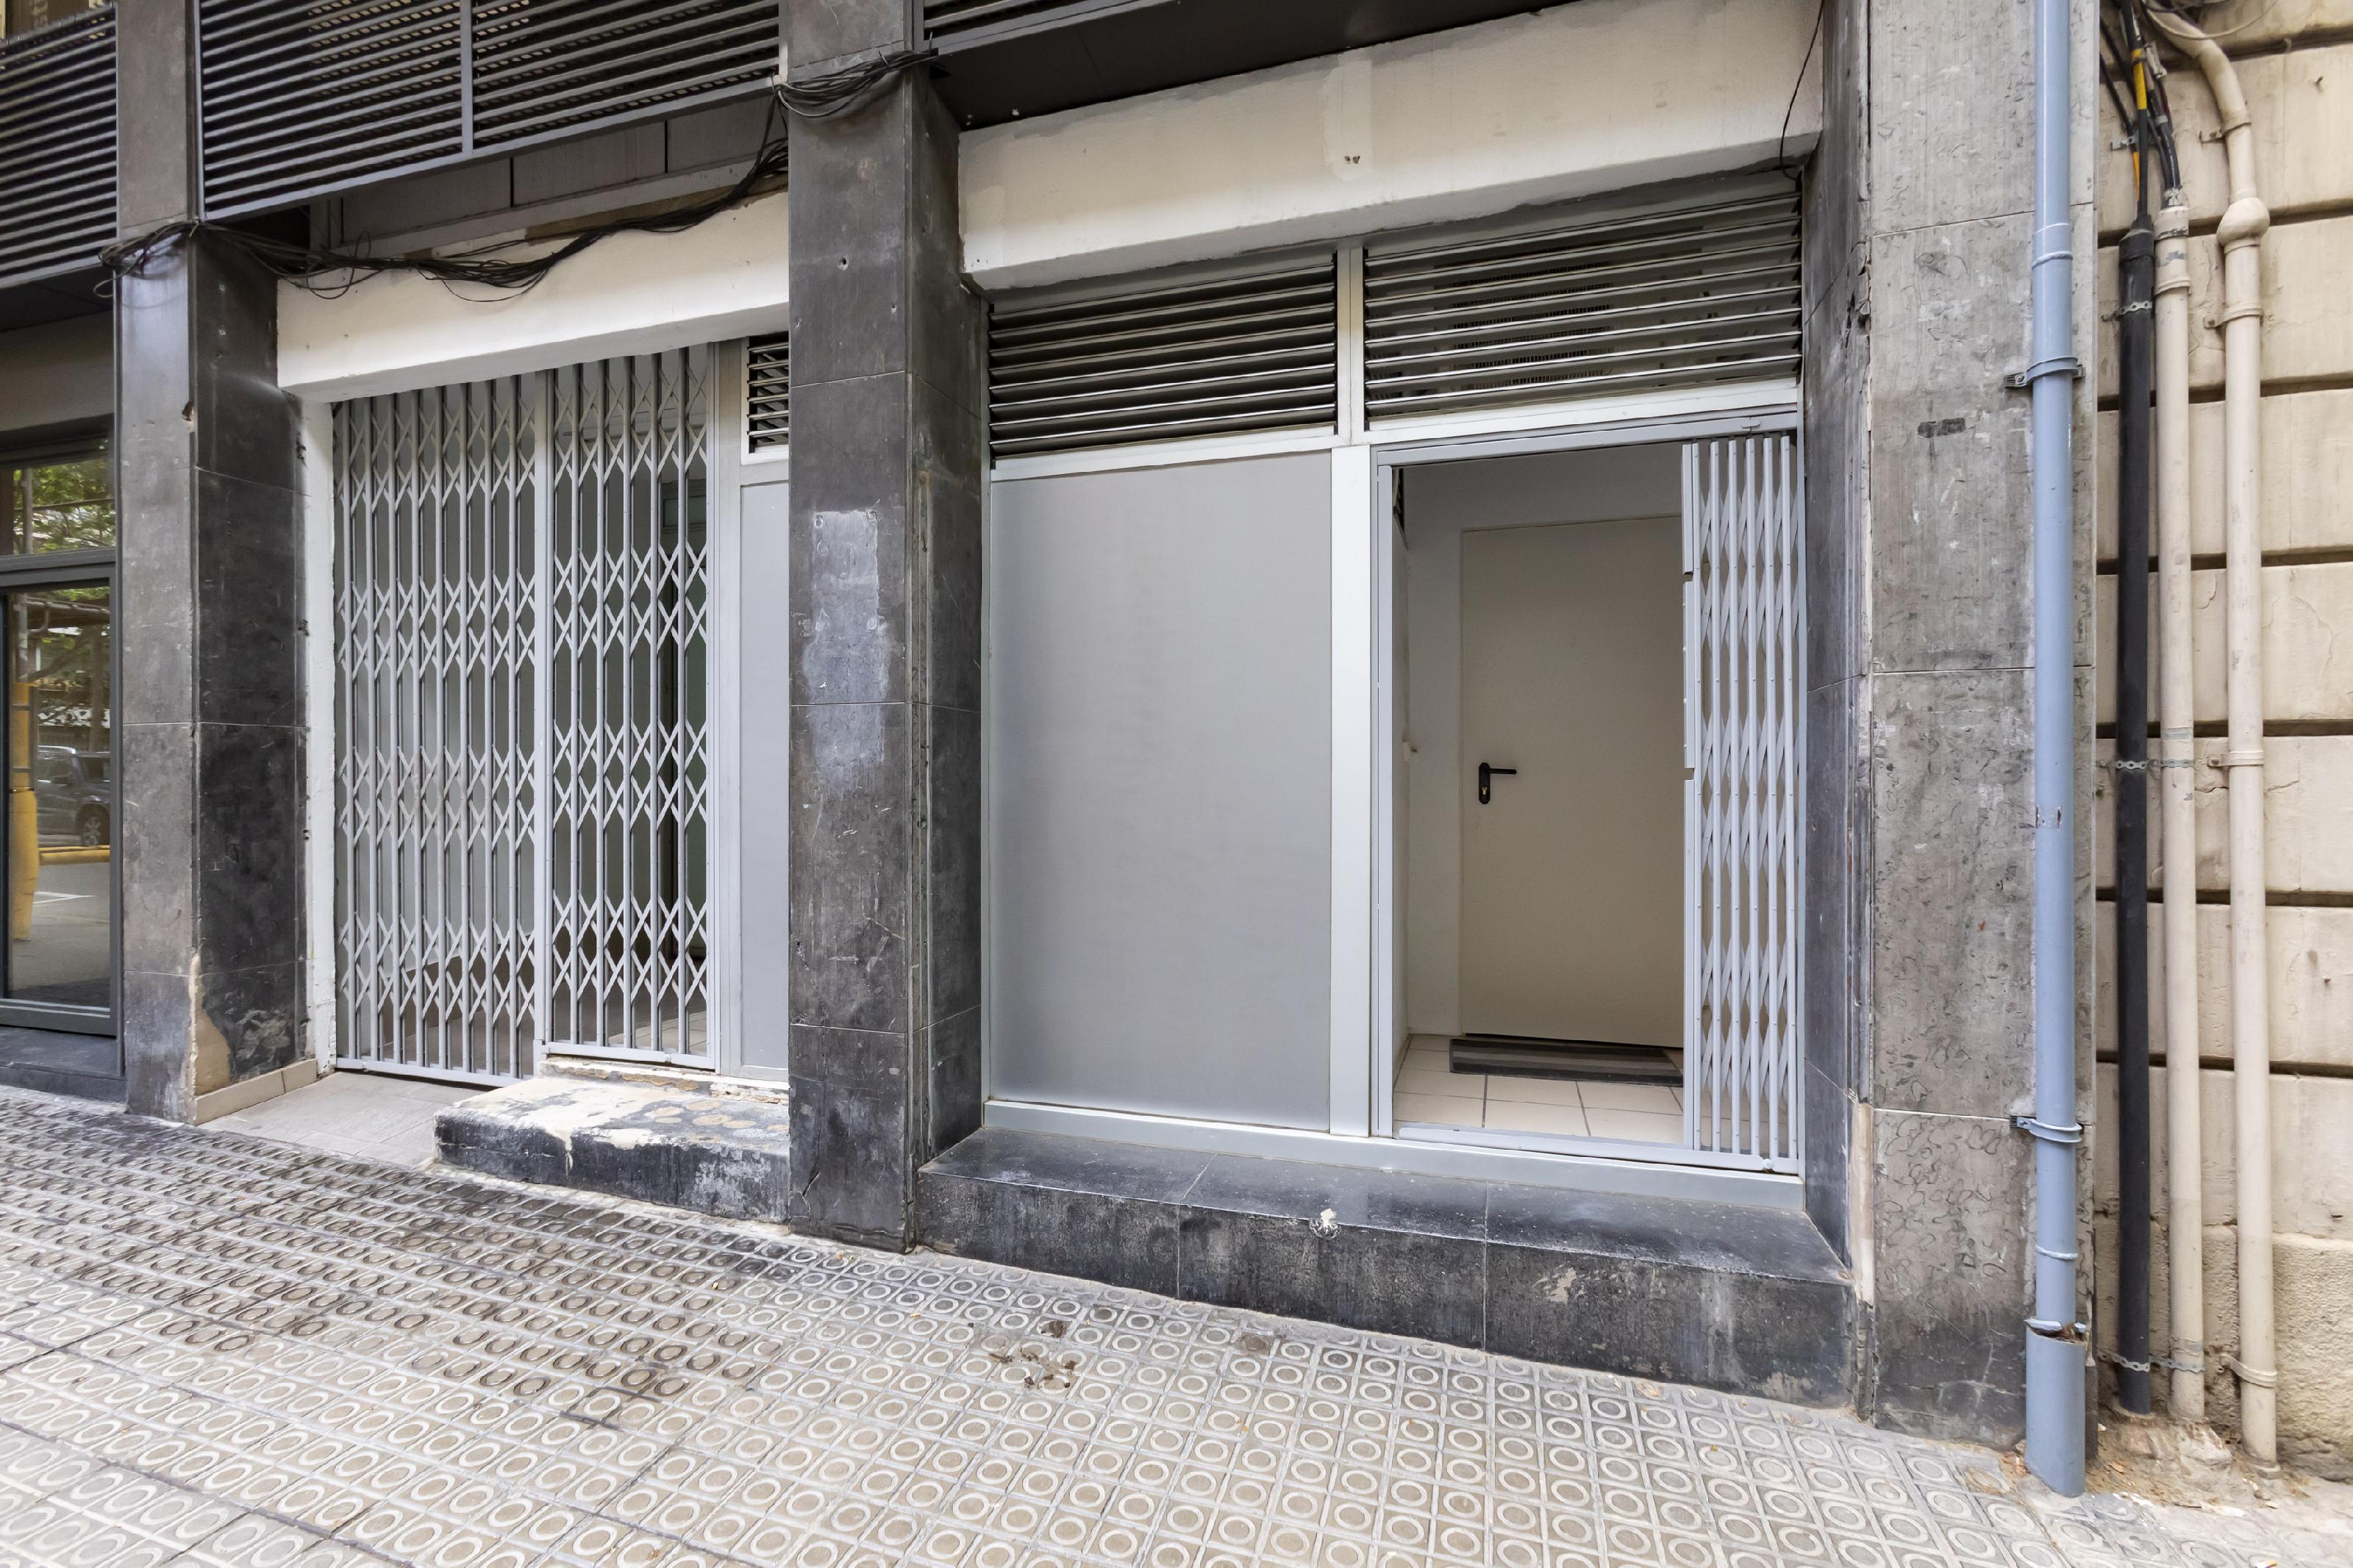 249493 Commercial premises for sale in Sarrià-Sant Gervasi, Sant Gervasi-Galvany 1